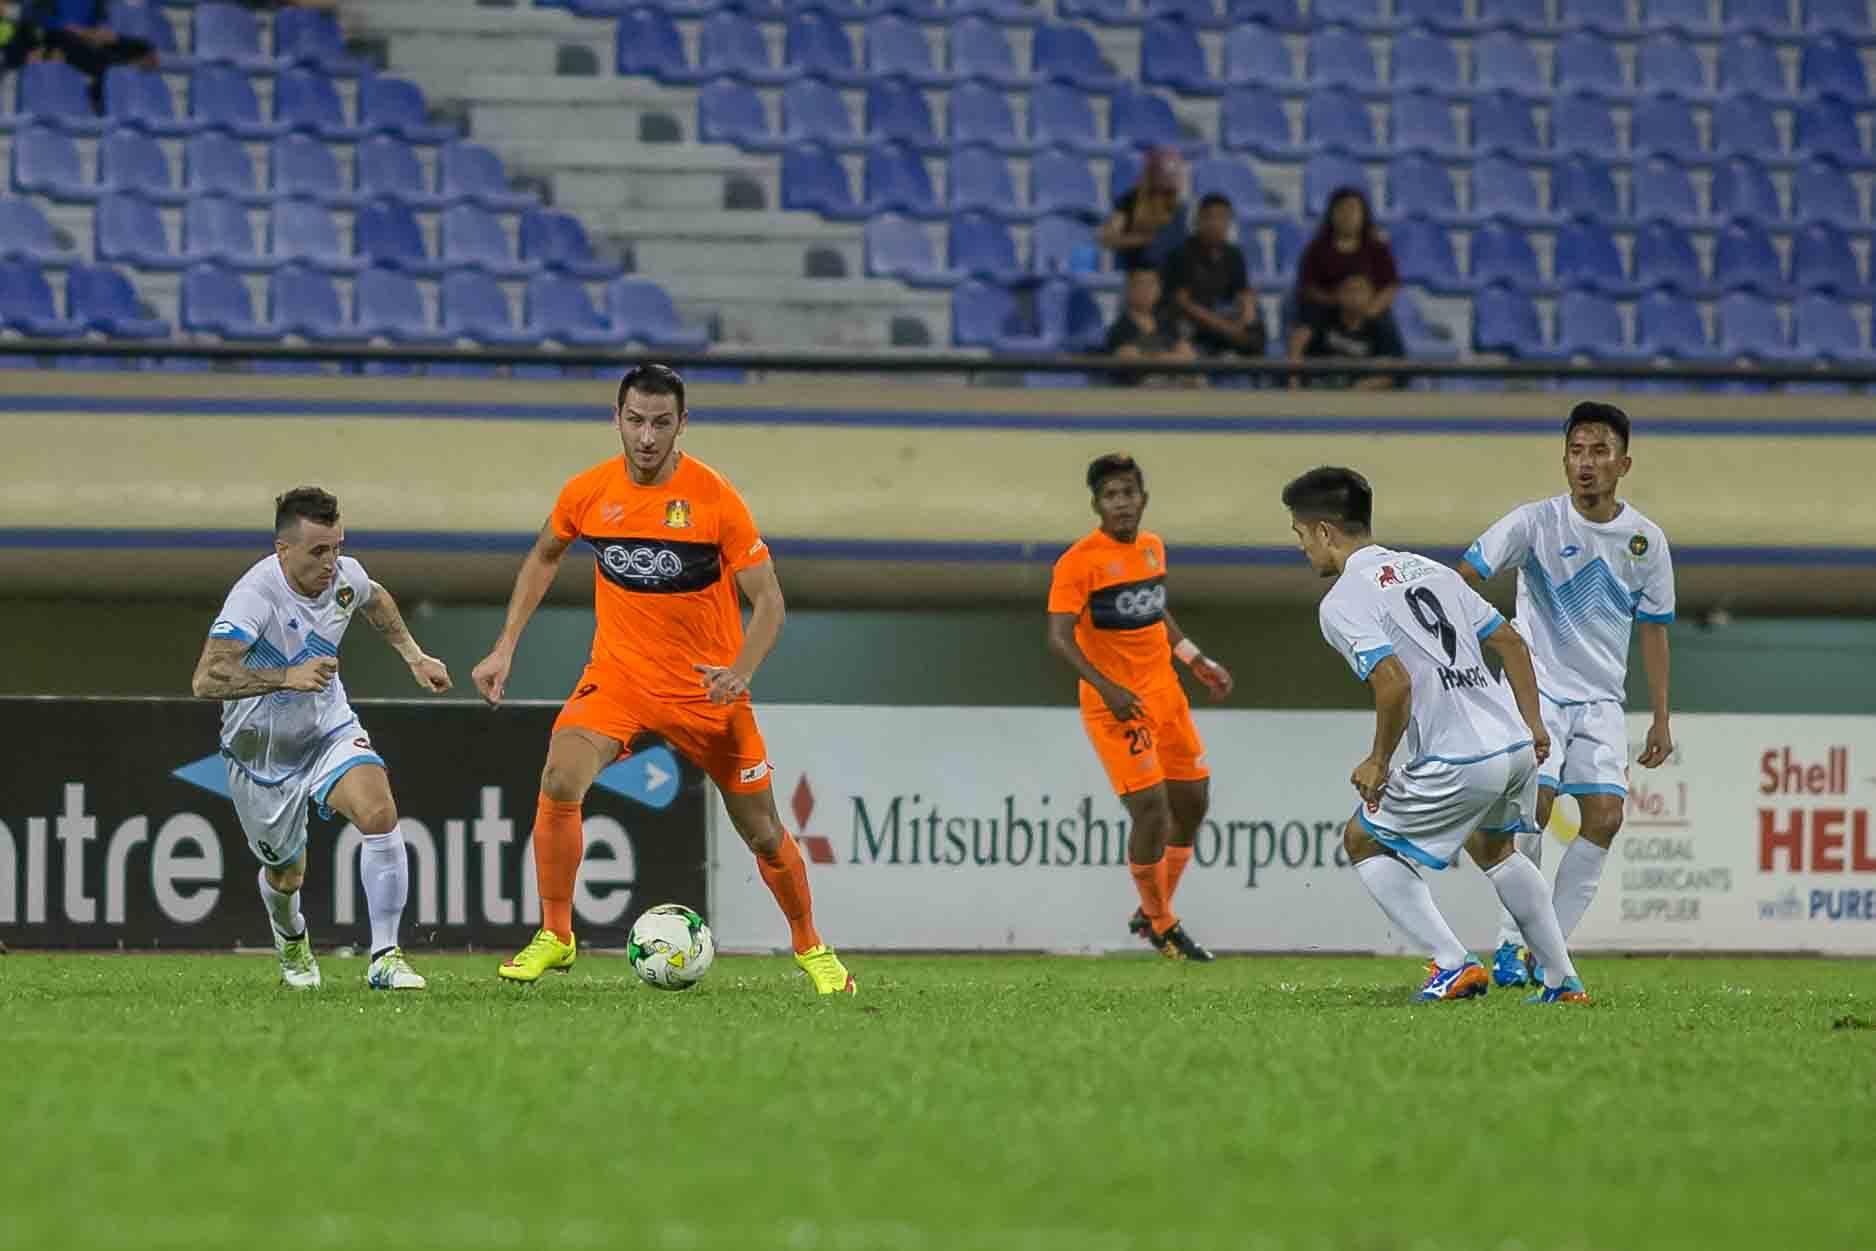 Stipe Plazibat scoring his 8th goal of the season via a direct free-kick.